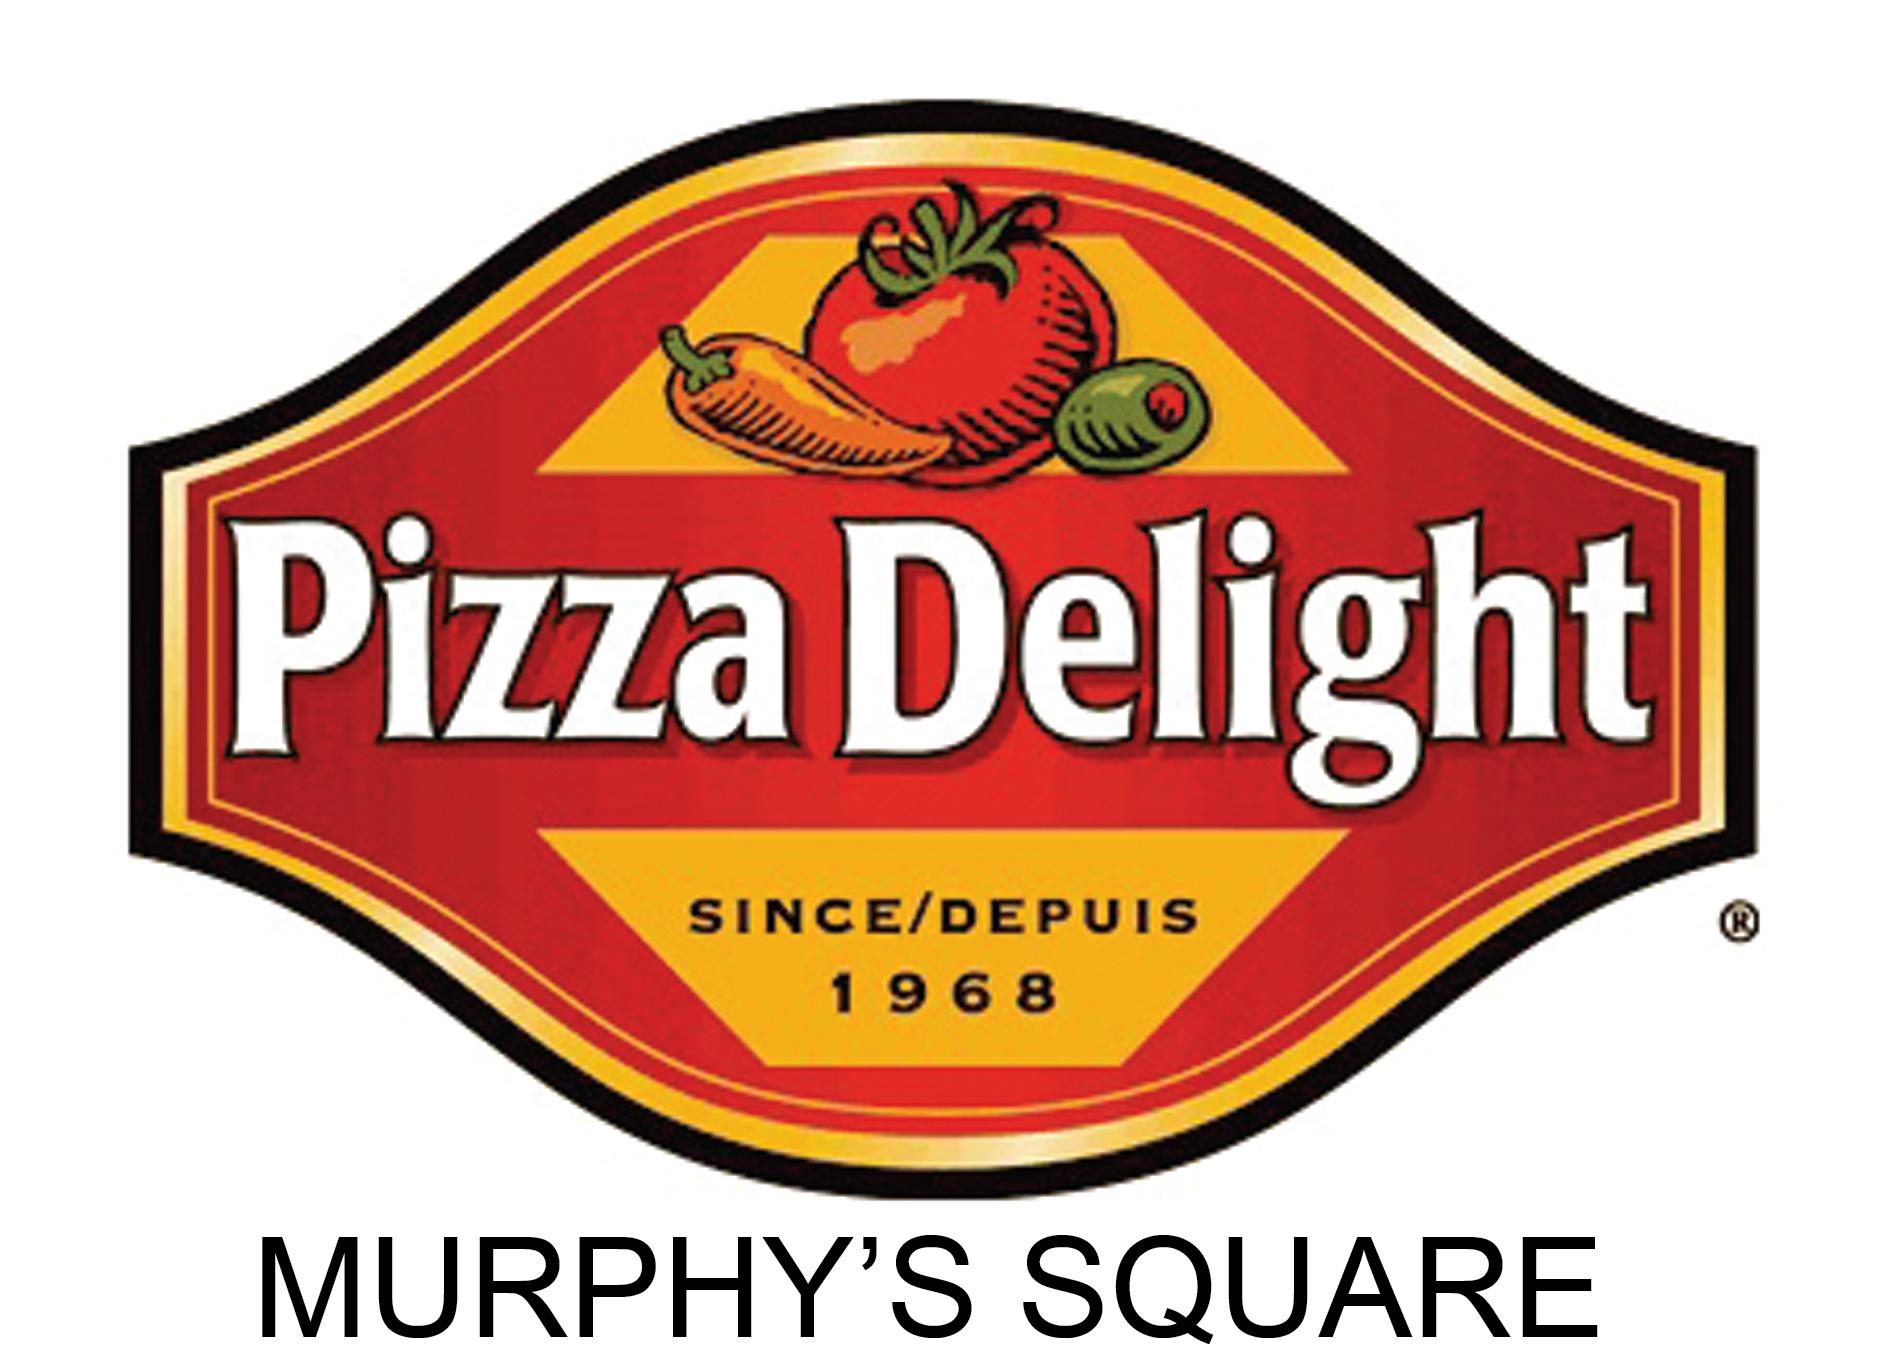 Pizza Delight Murphys logo-01.jpg